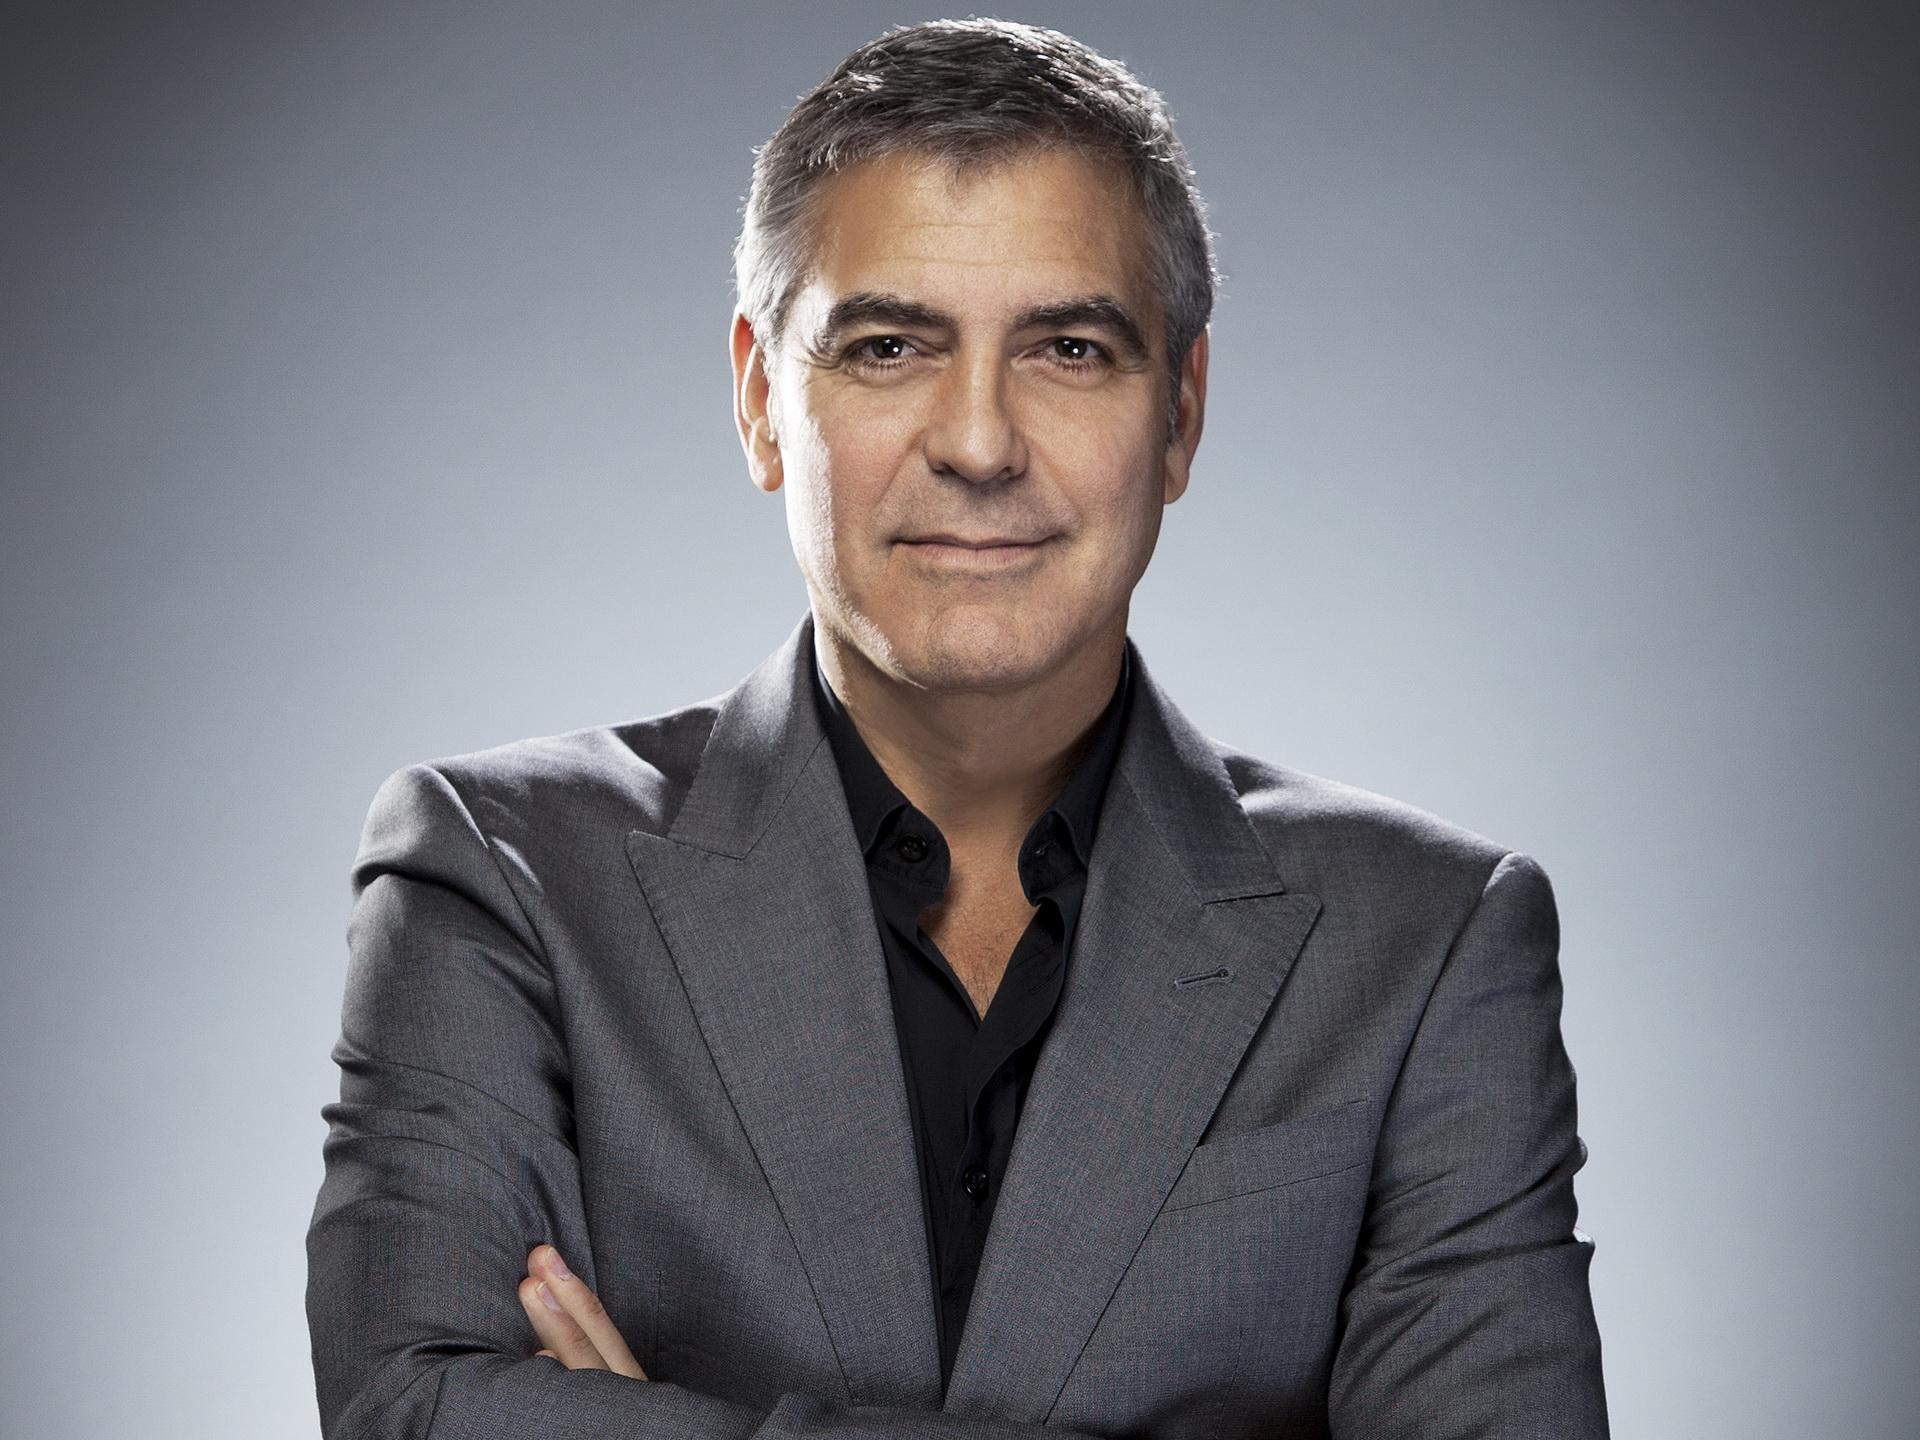 Sun 20 Sep CEST 2015   1920x1440 George Clooney Desktop Wallpapers 1920x1440